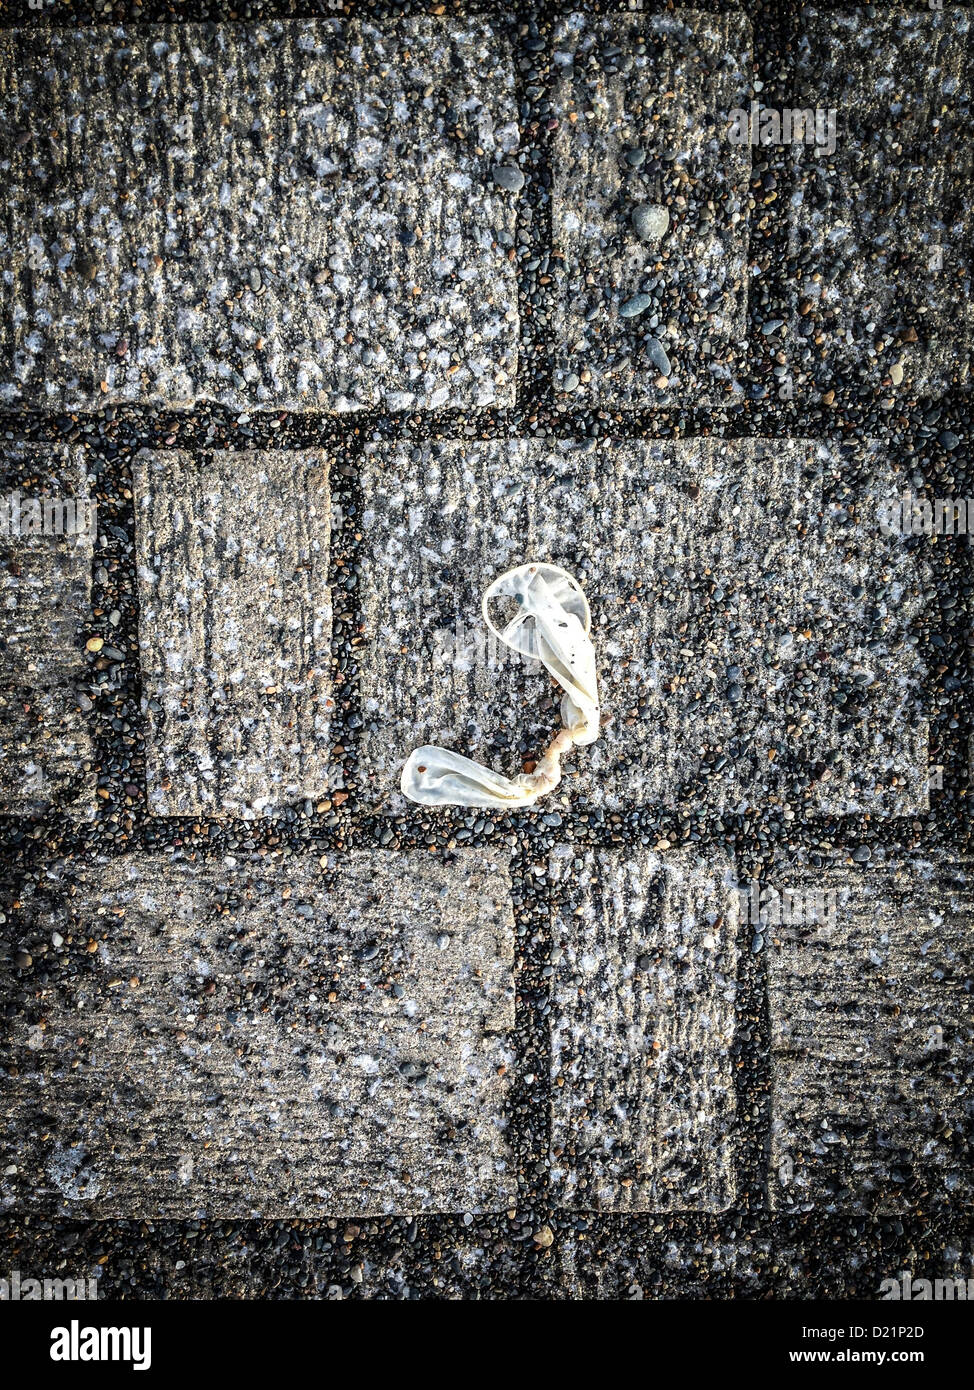 Condom Condom Stockfotos & Condom Condom Bilder - Alamy